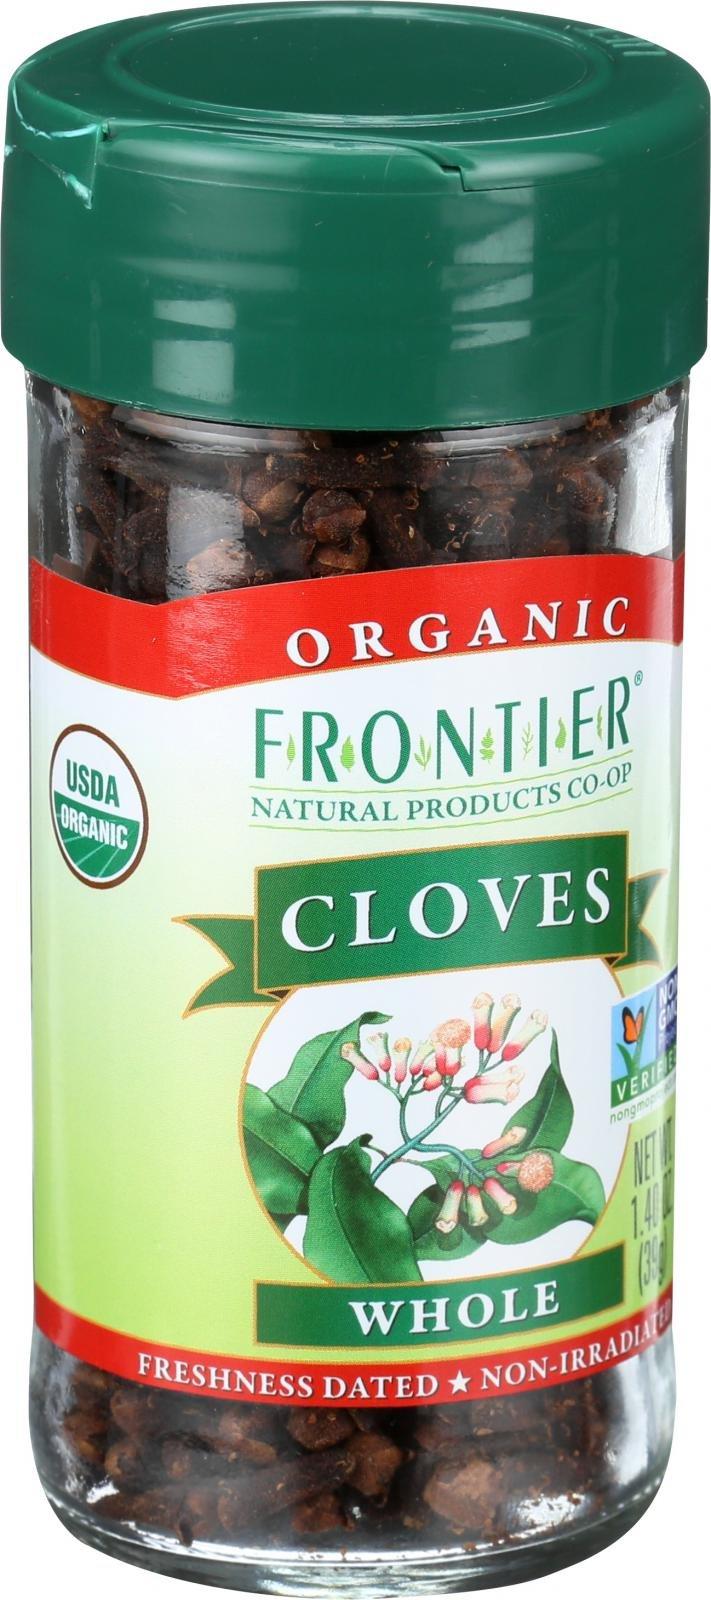 Frontier Herb Cloves - Organic - Whole - Kosher - Non GMO - 1.40 oz